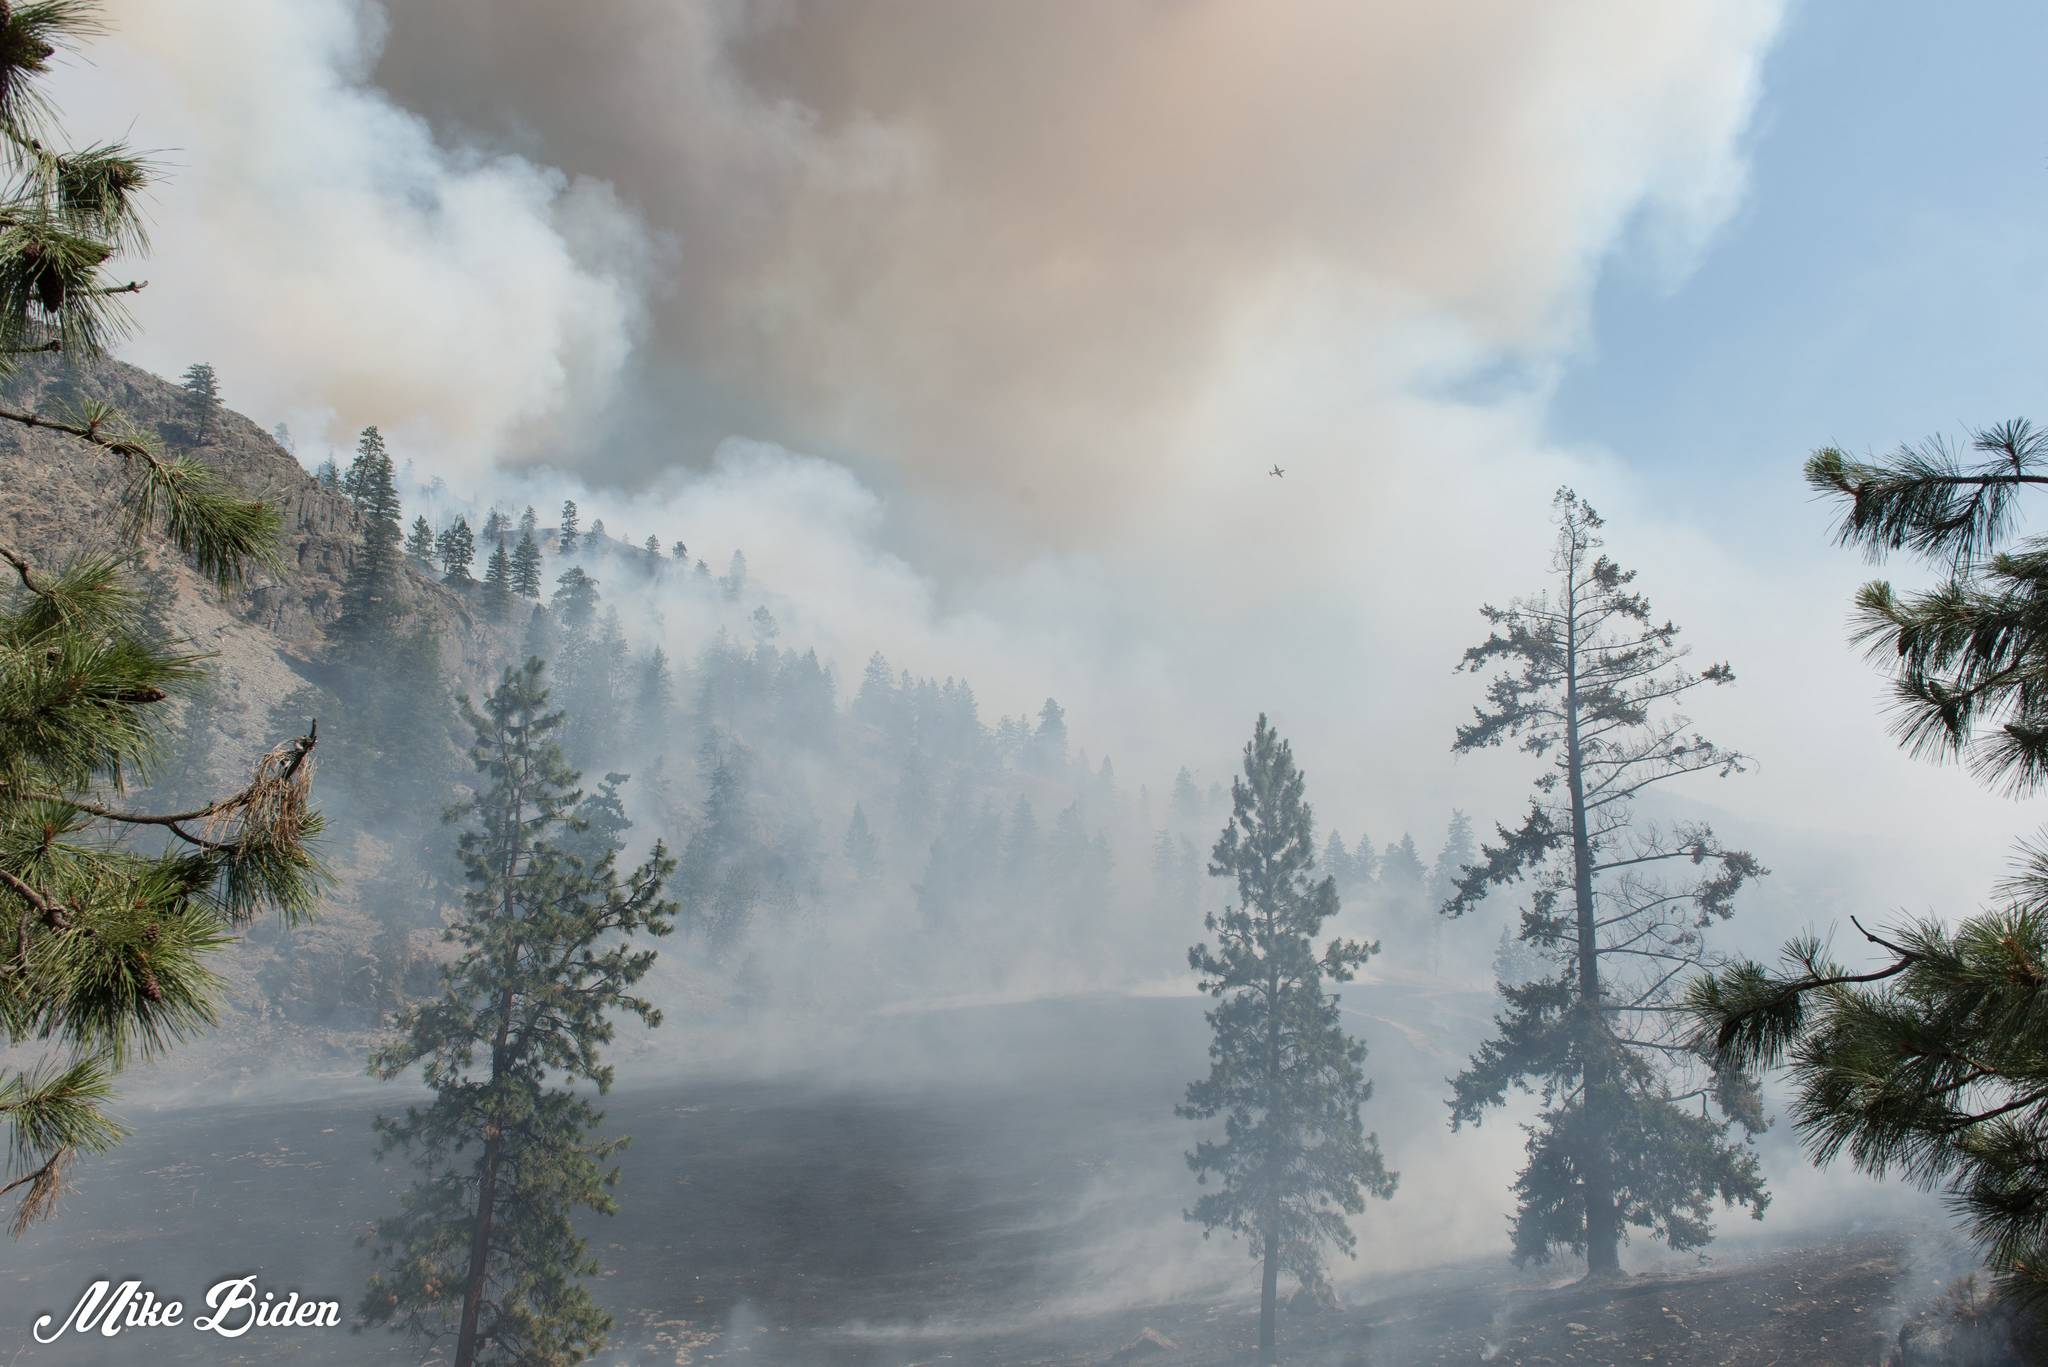 Mike Biden photos of the Thomas Creek fire.